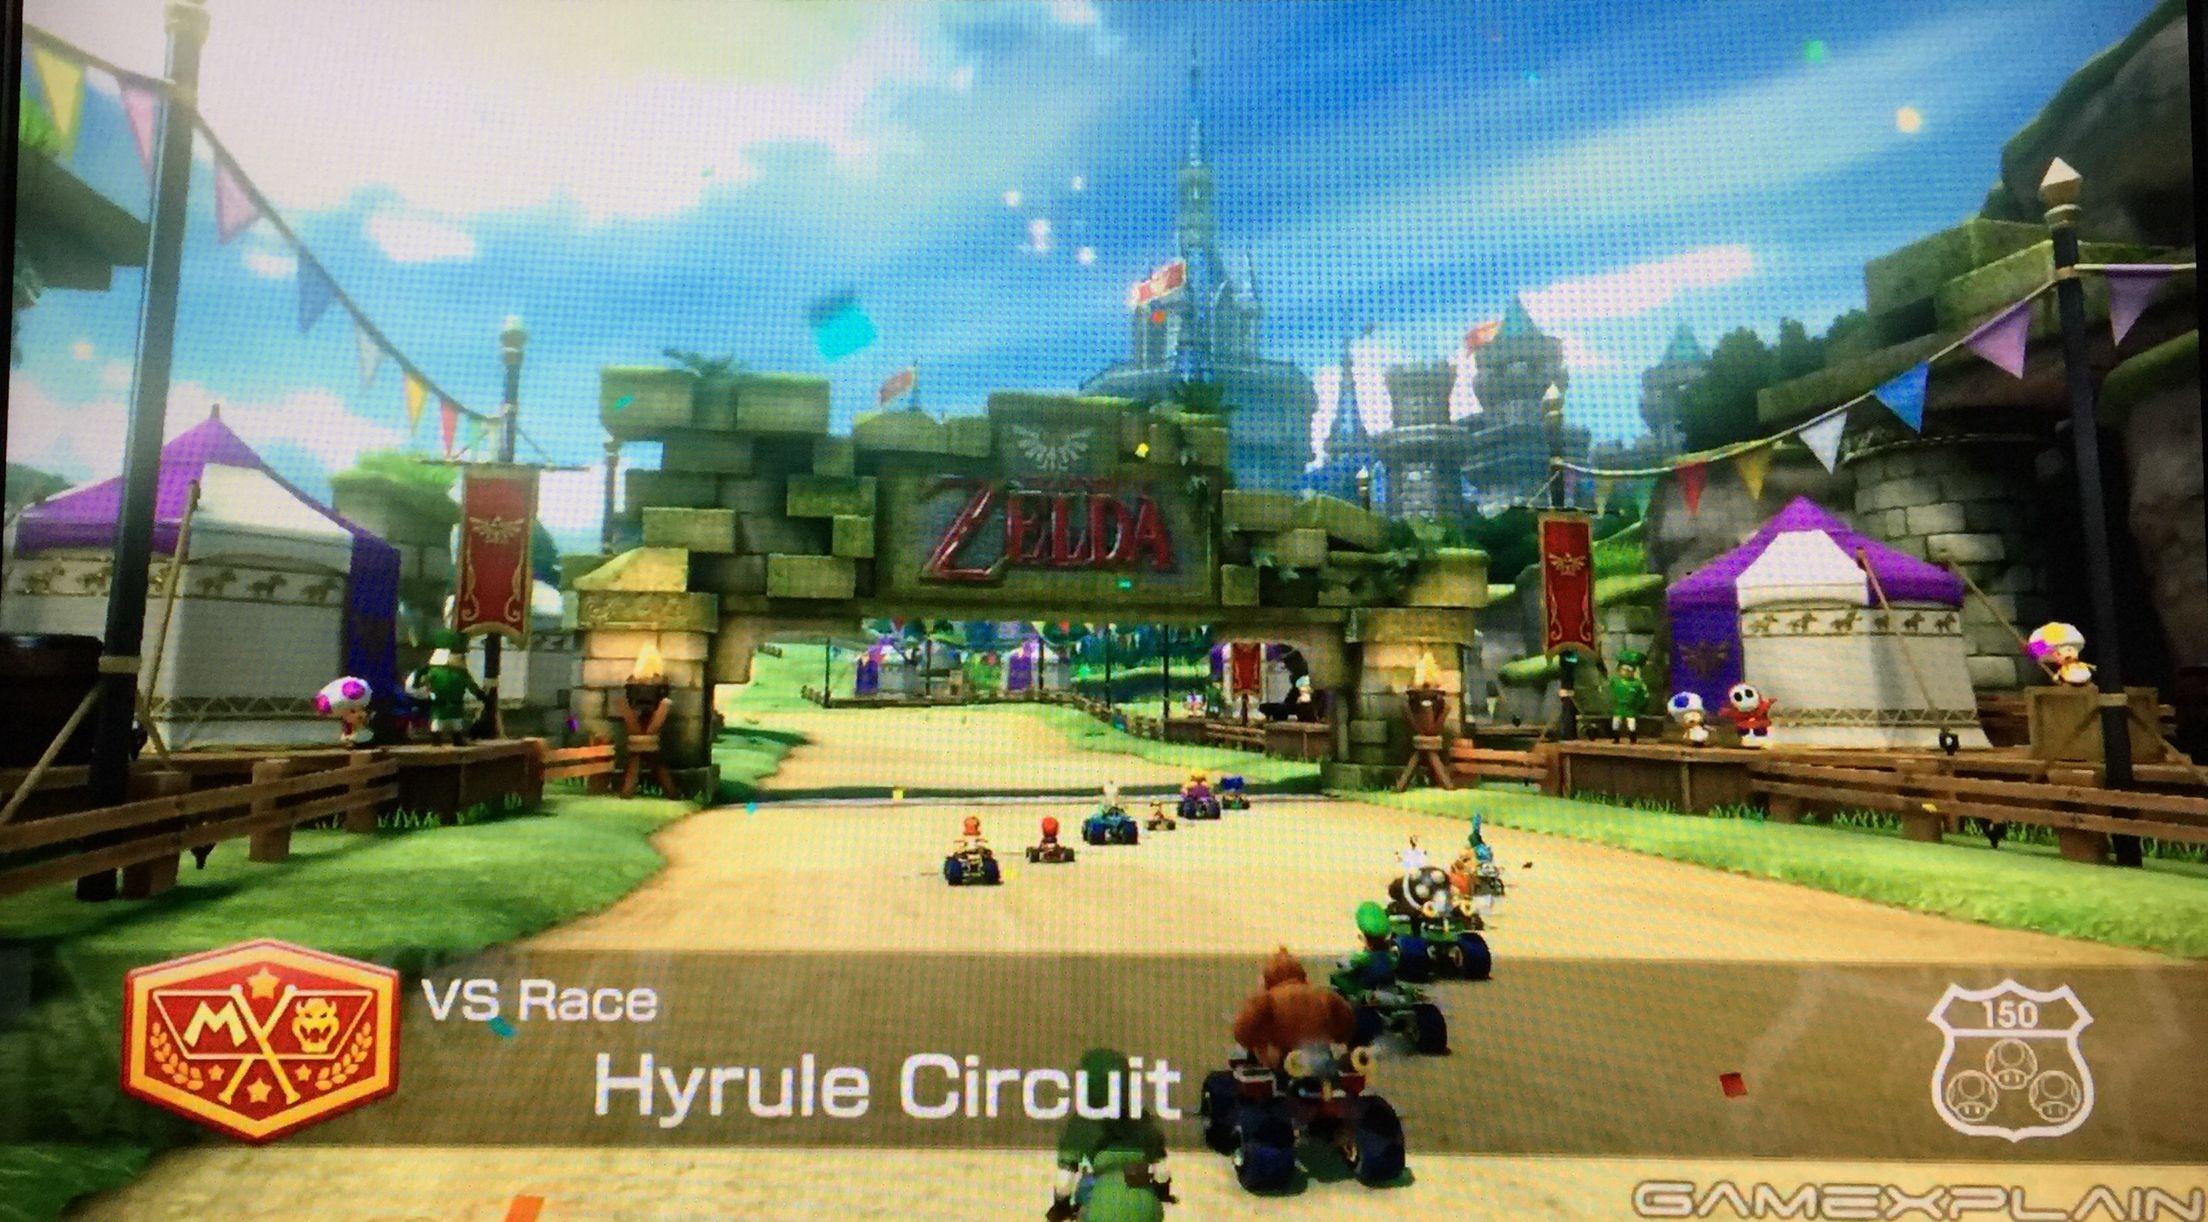 Mario Kart 8 DLC Pack 1 Triforce Cup Hyrule Circuit